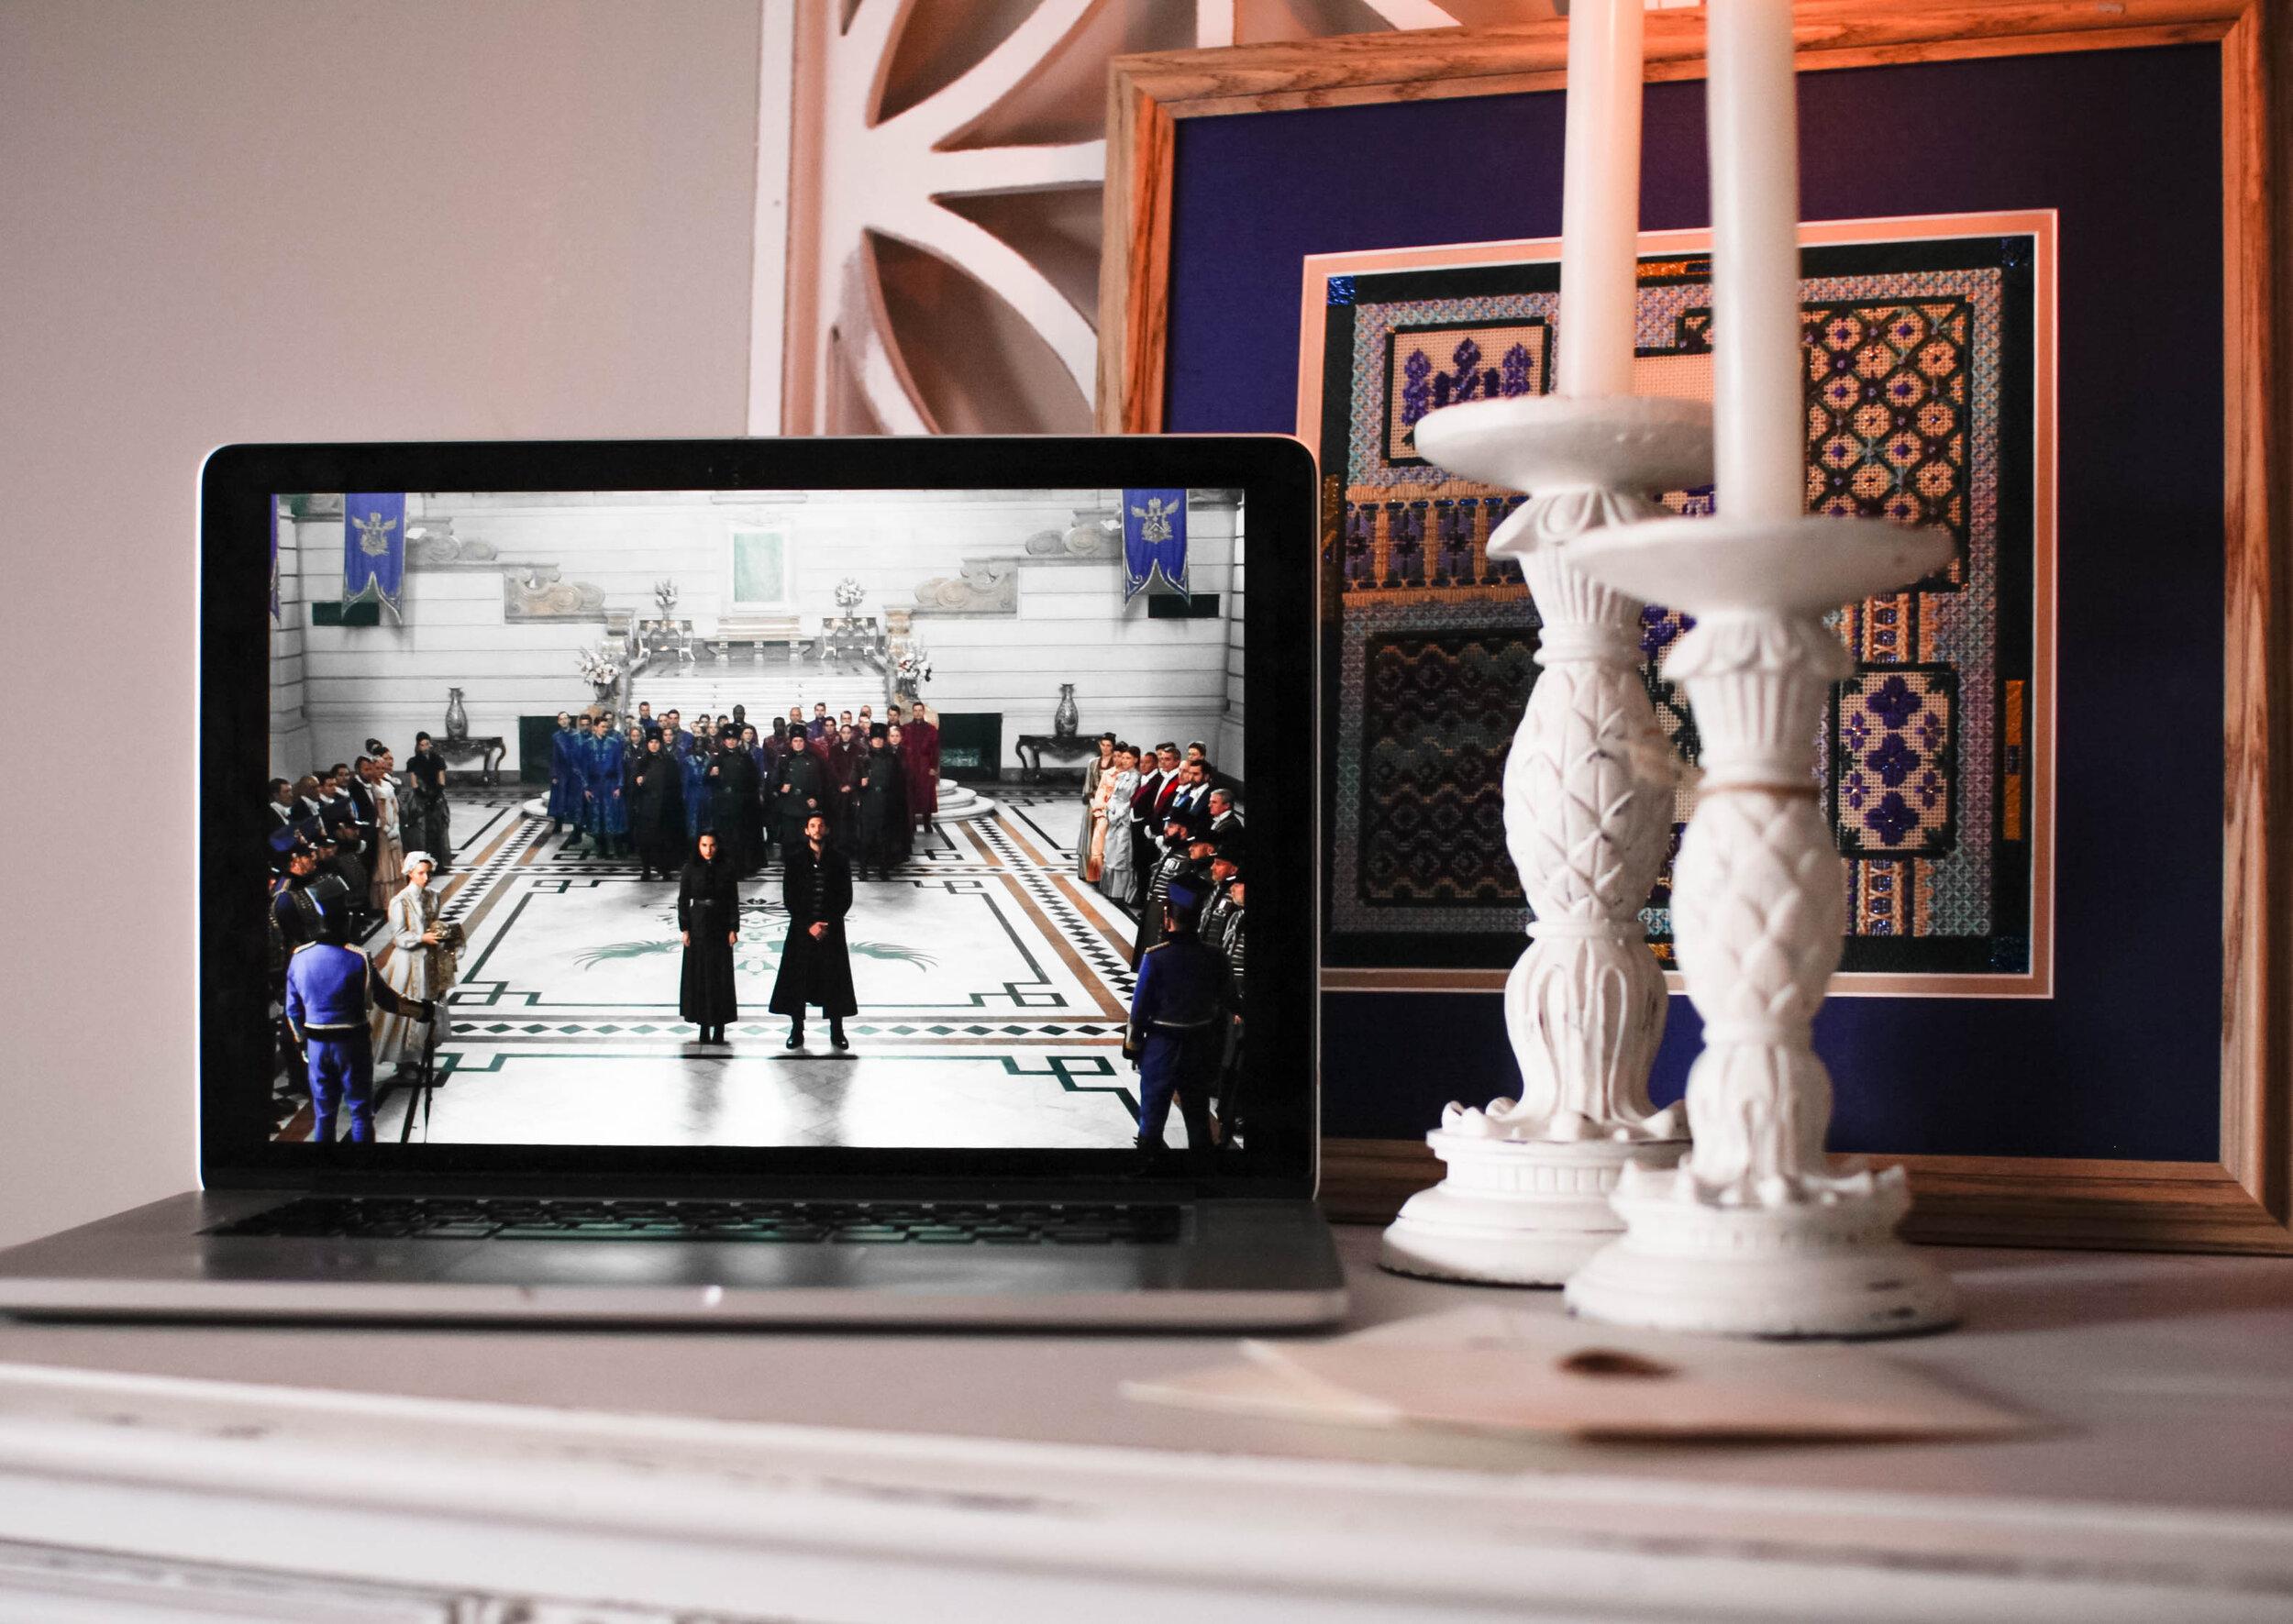 Shadow and Bone Netflix fantasy TV show renewed for season 2